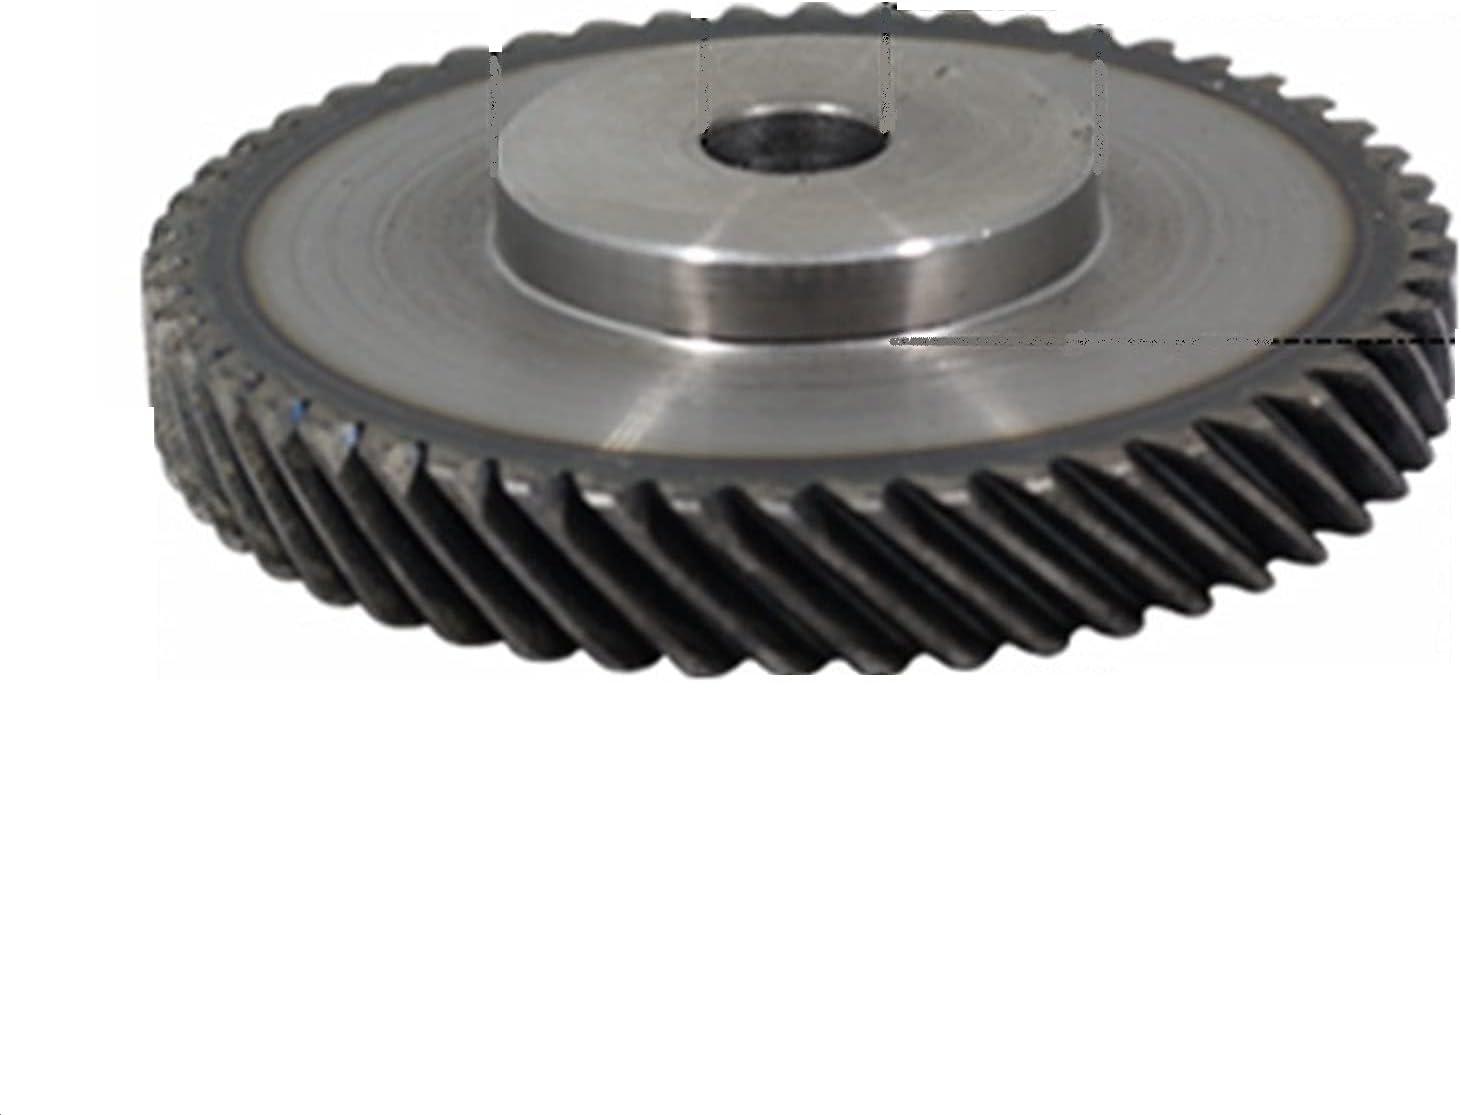 ZHENGGUIFANG ZGF-BR Helical Gear 1.5 MOD Teeth Very popular 15m Inner Max 60% OFF Hole 50